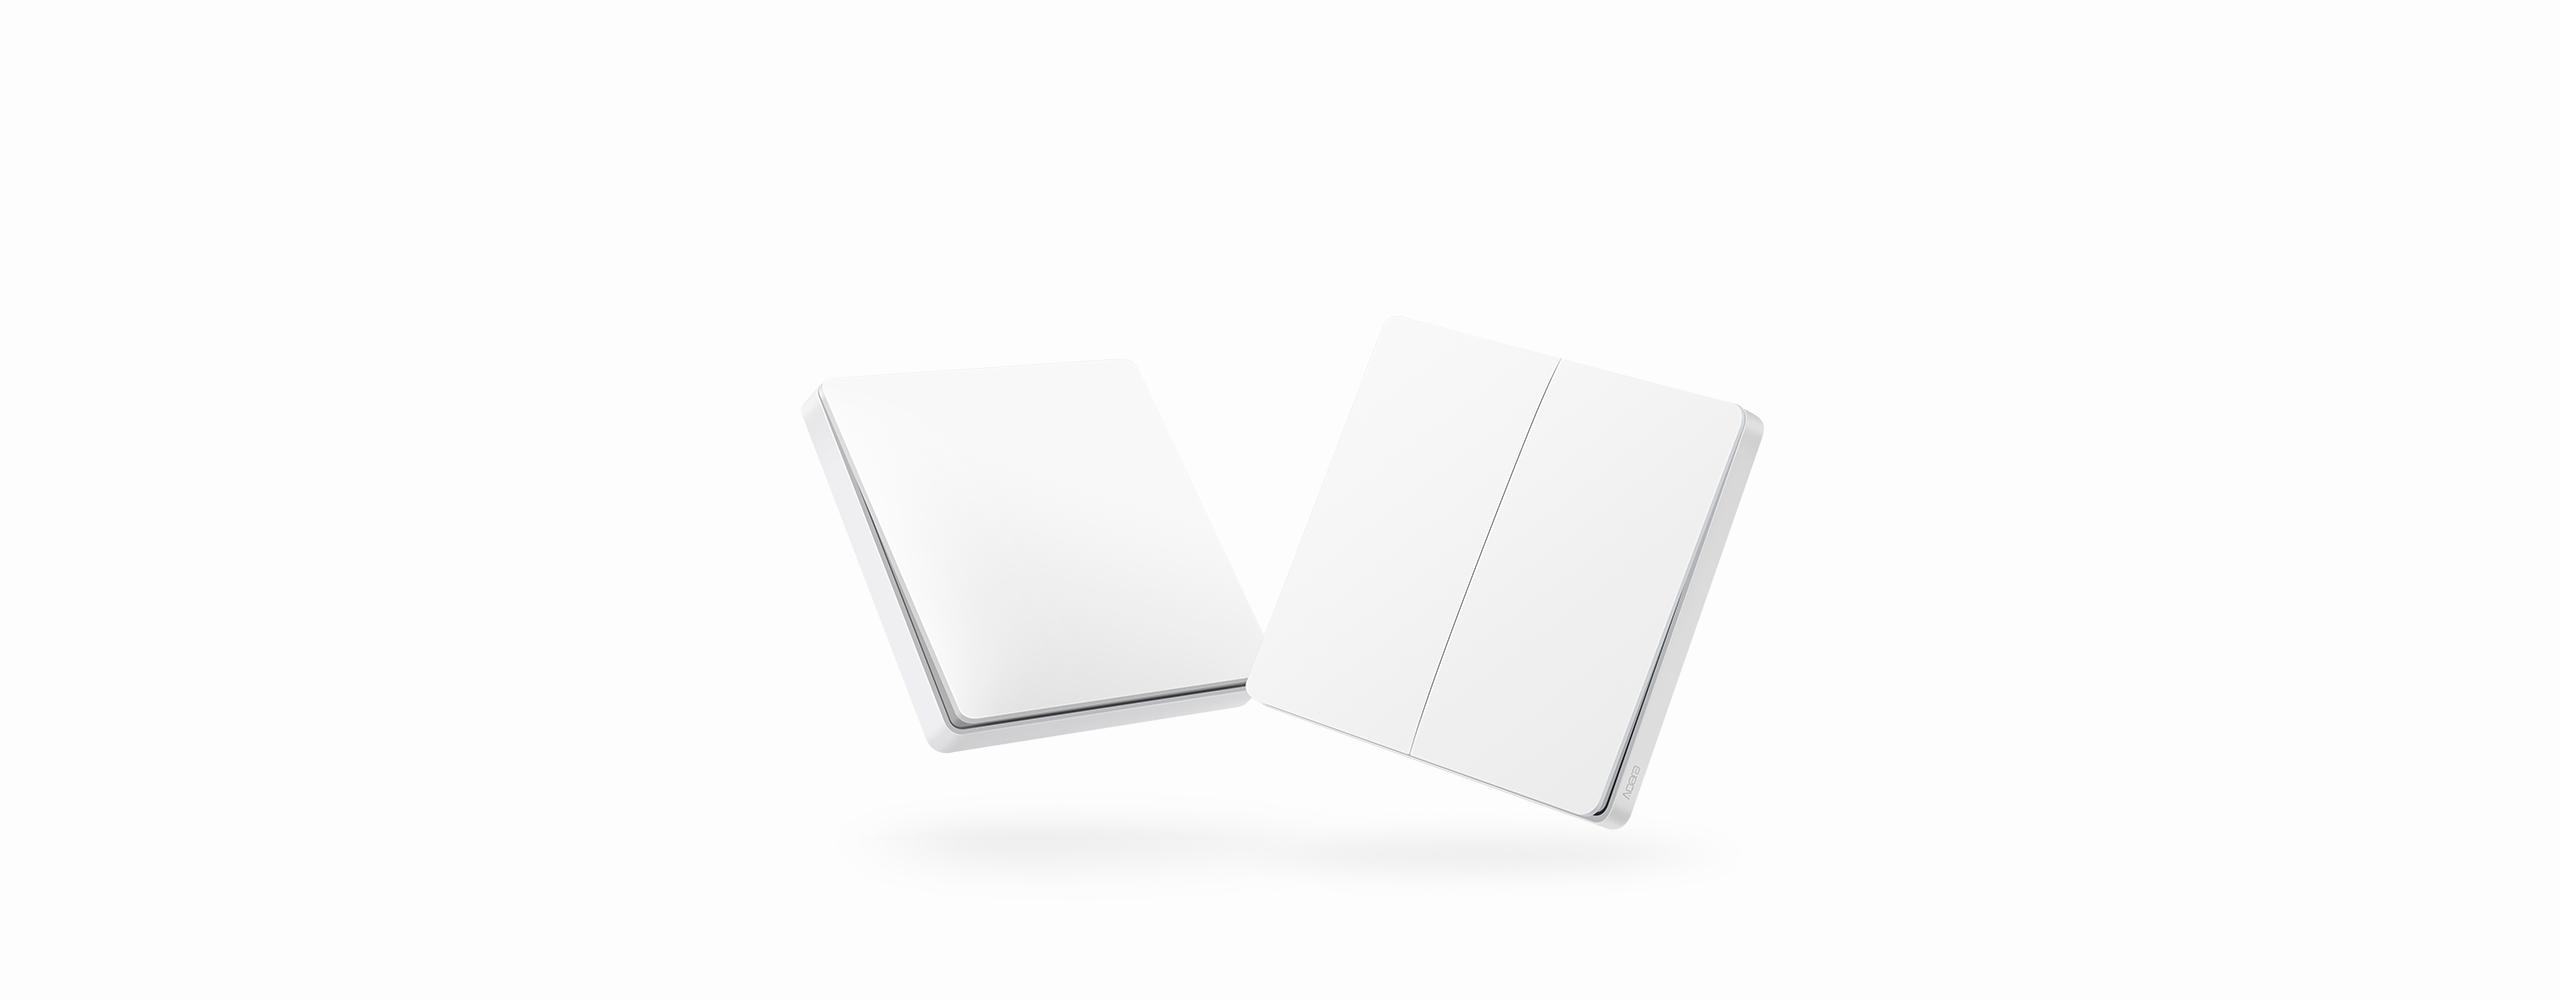 Aqara wireless remote light switch simplifies smart lighting